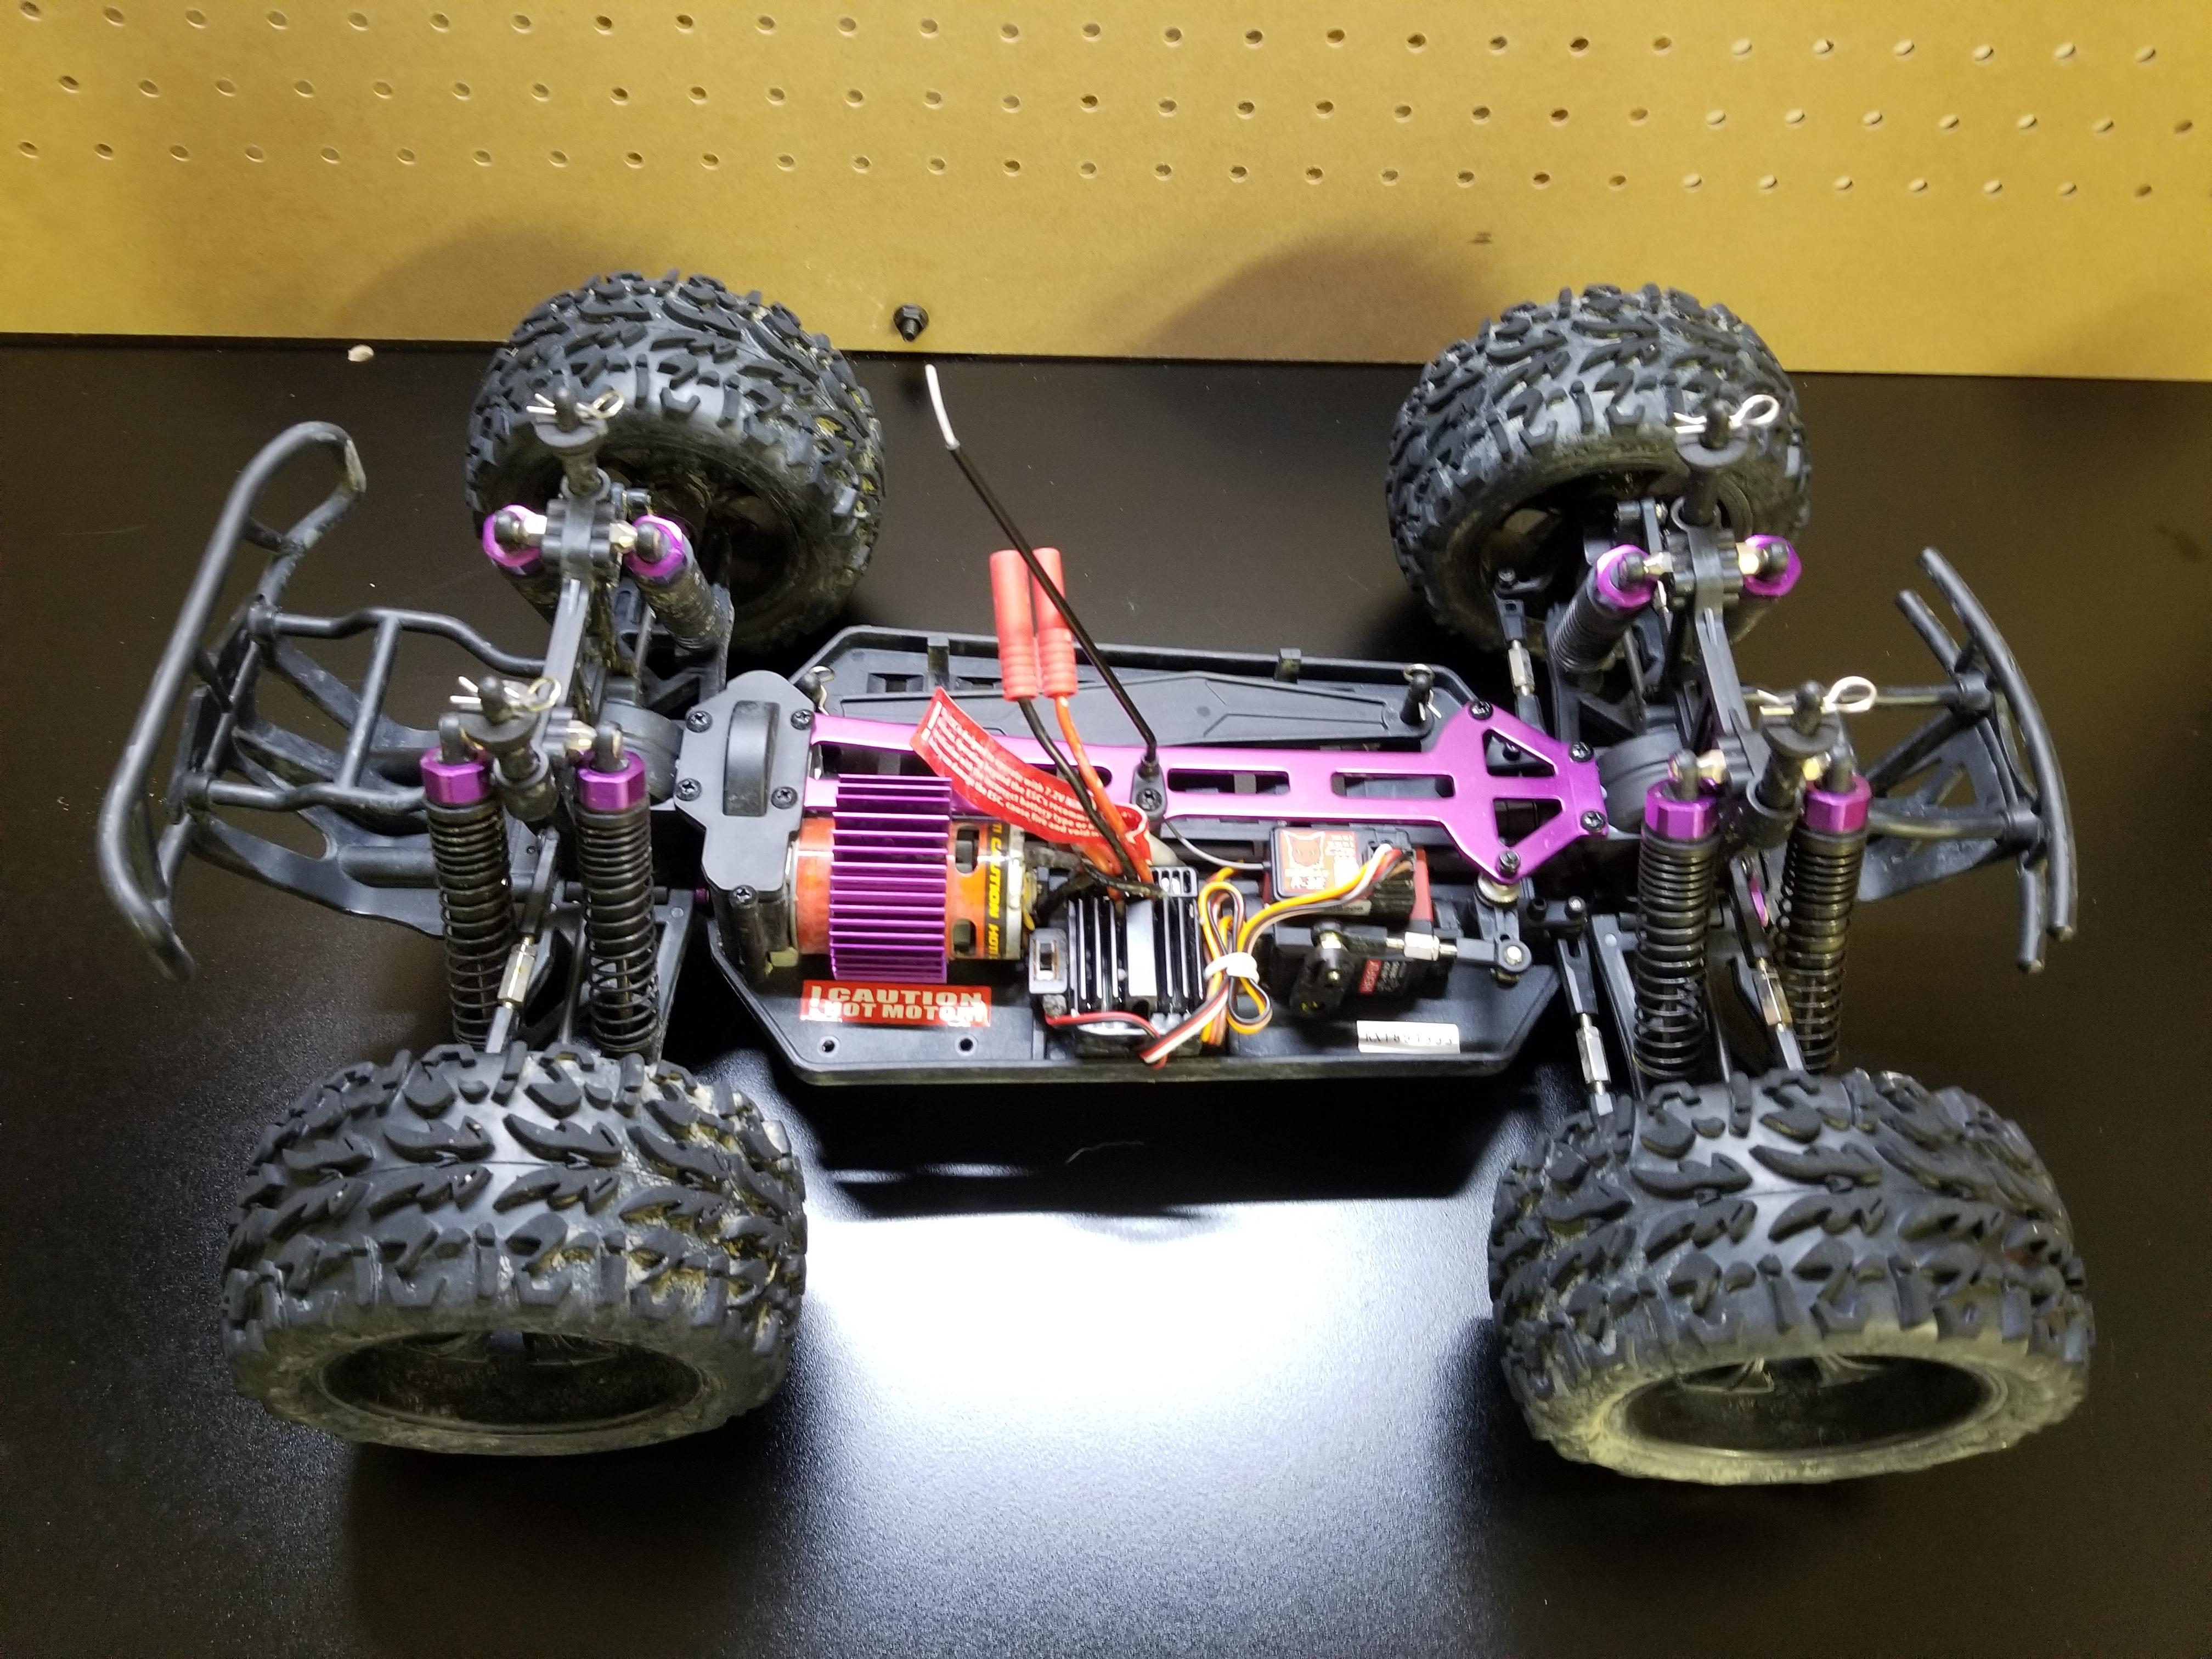 Volcano EPX 4x4 suspension